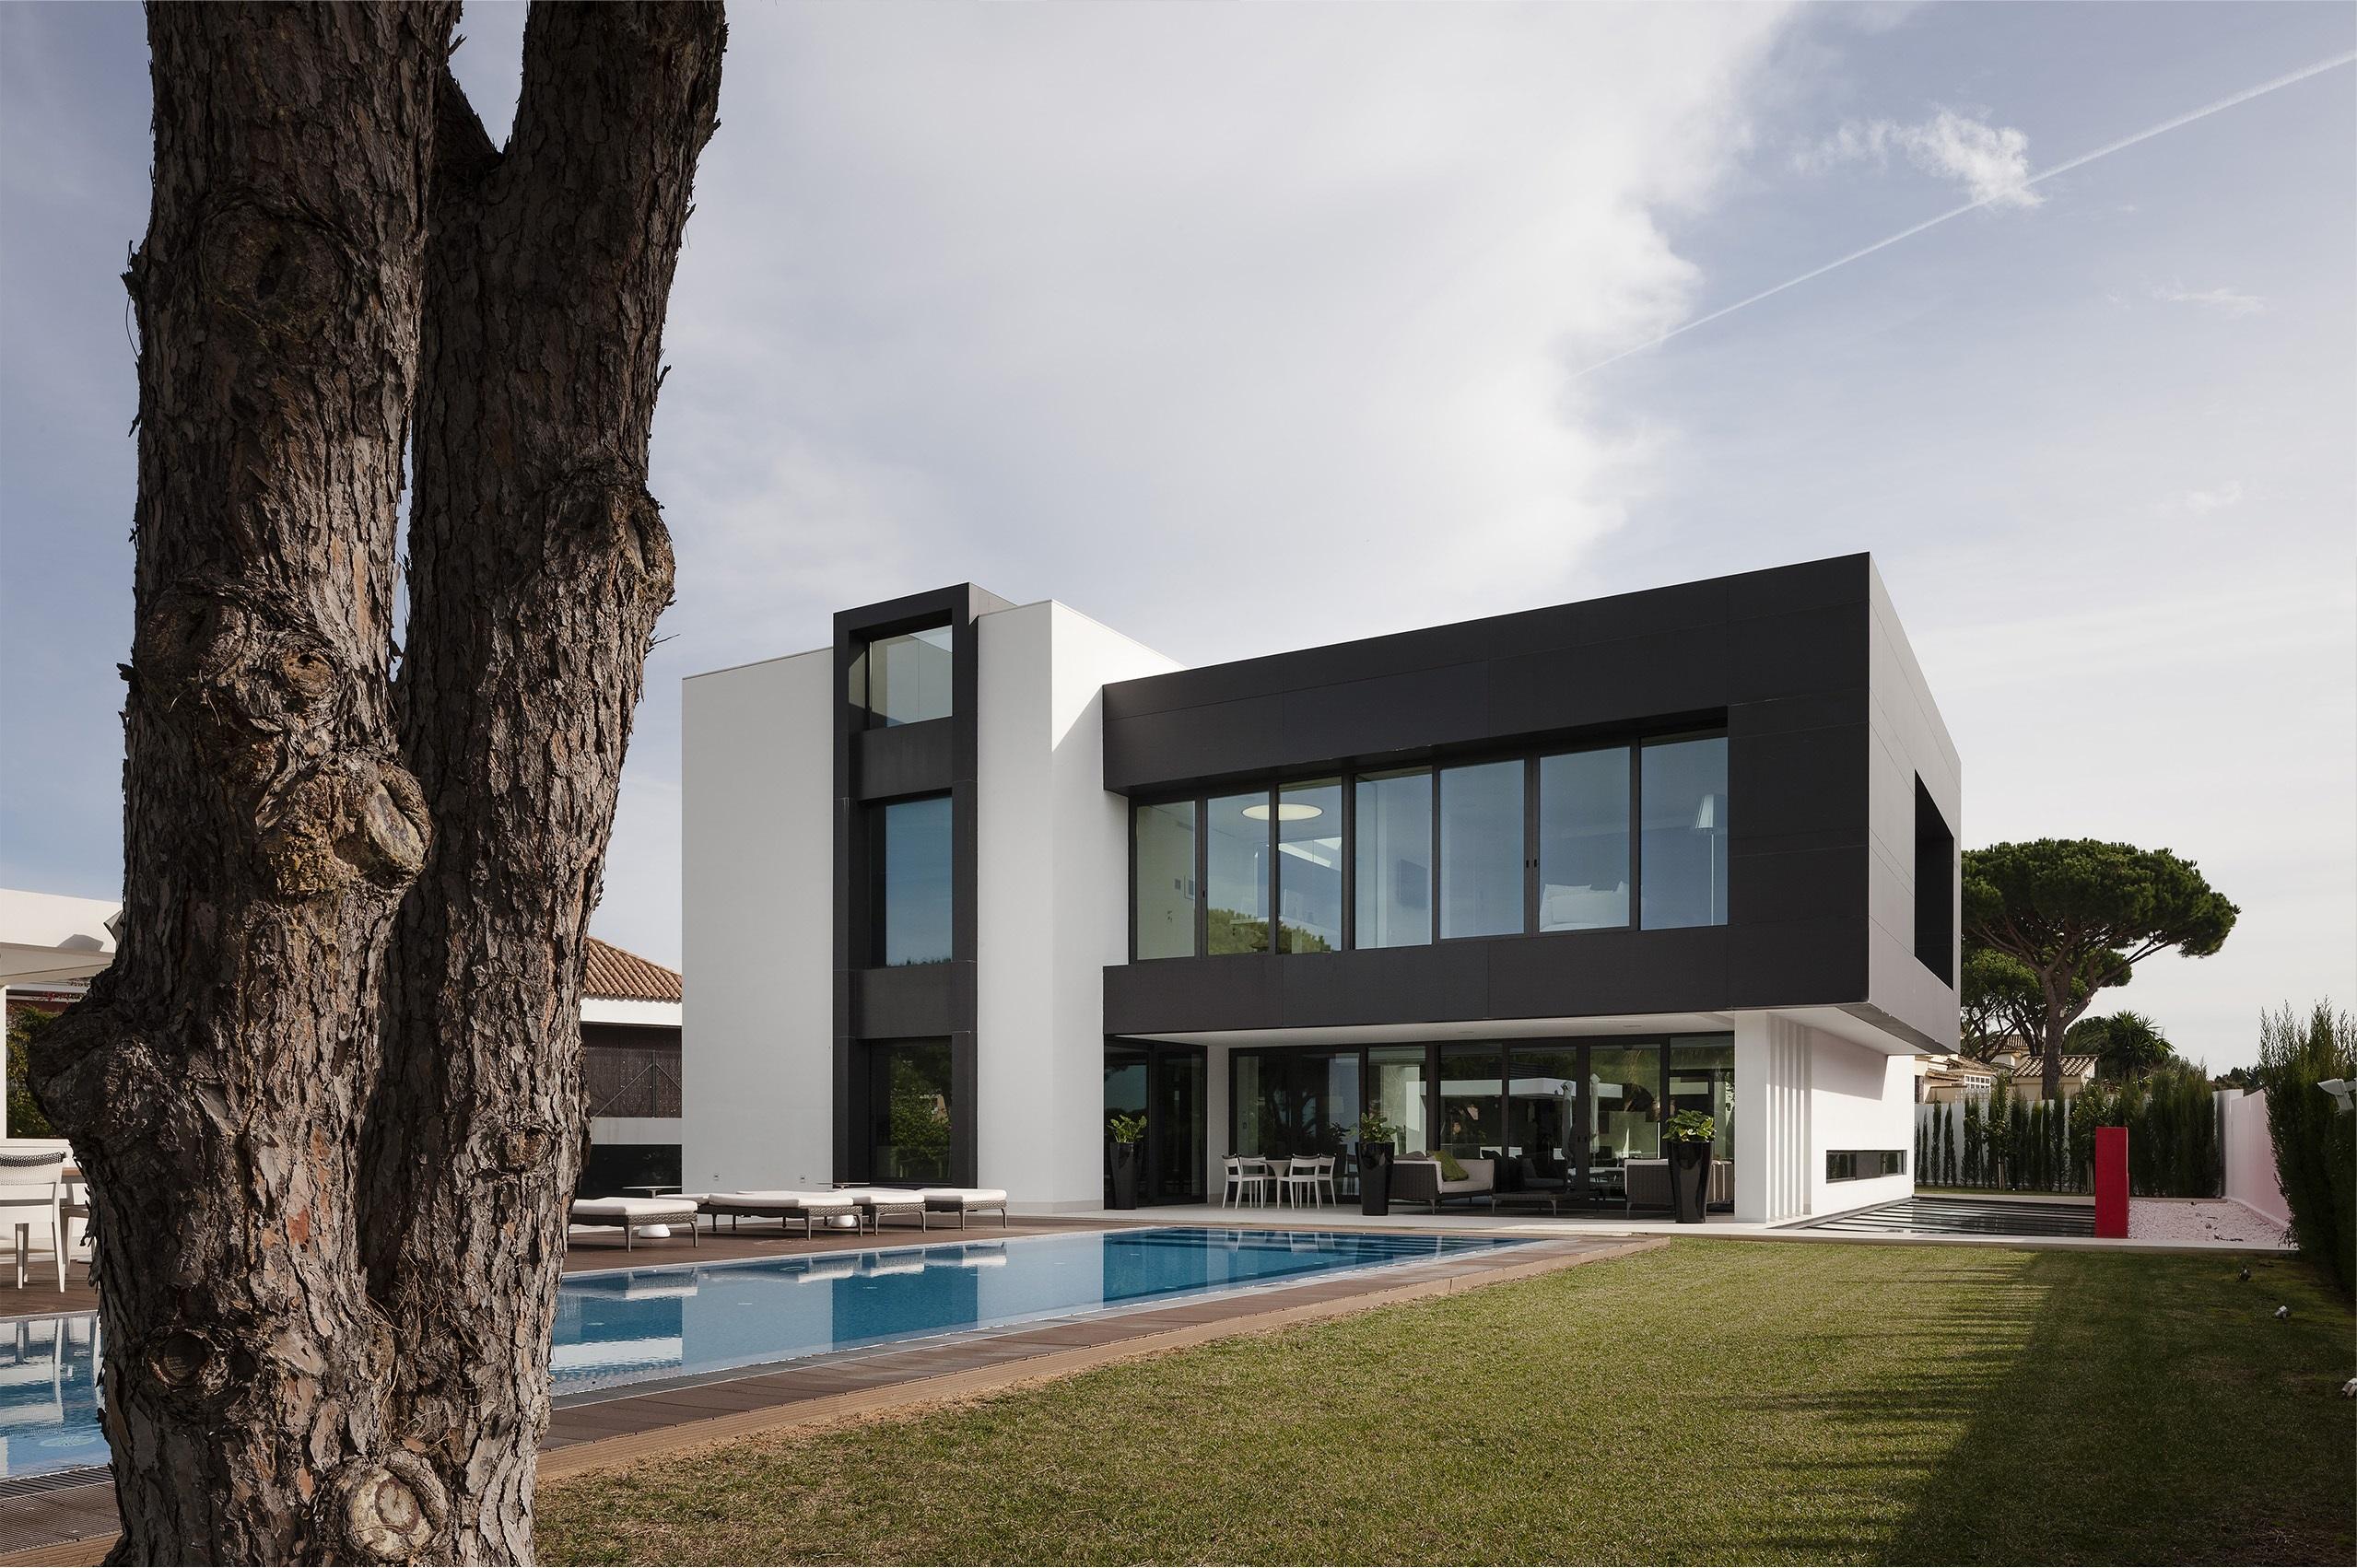 project manager Cádiz, arquitectura, construcción, proyecto